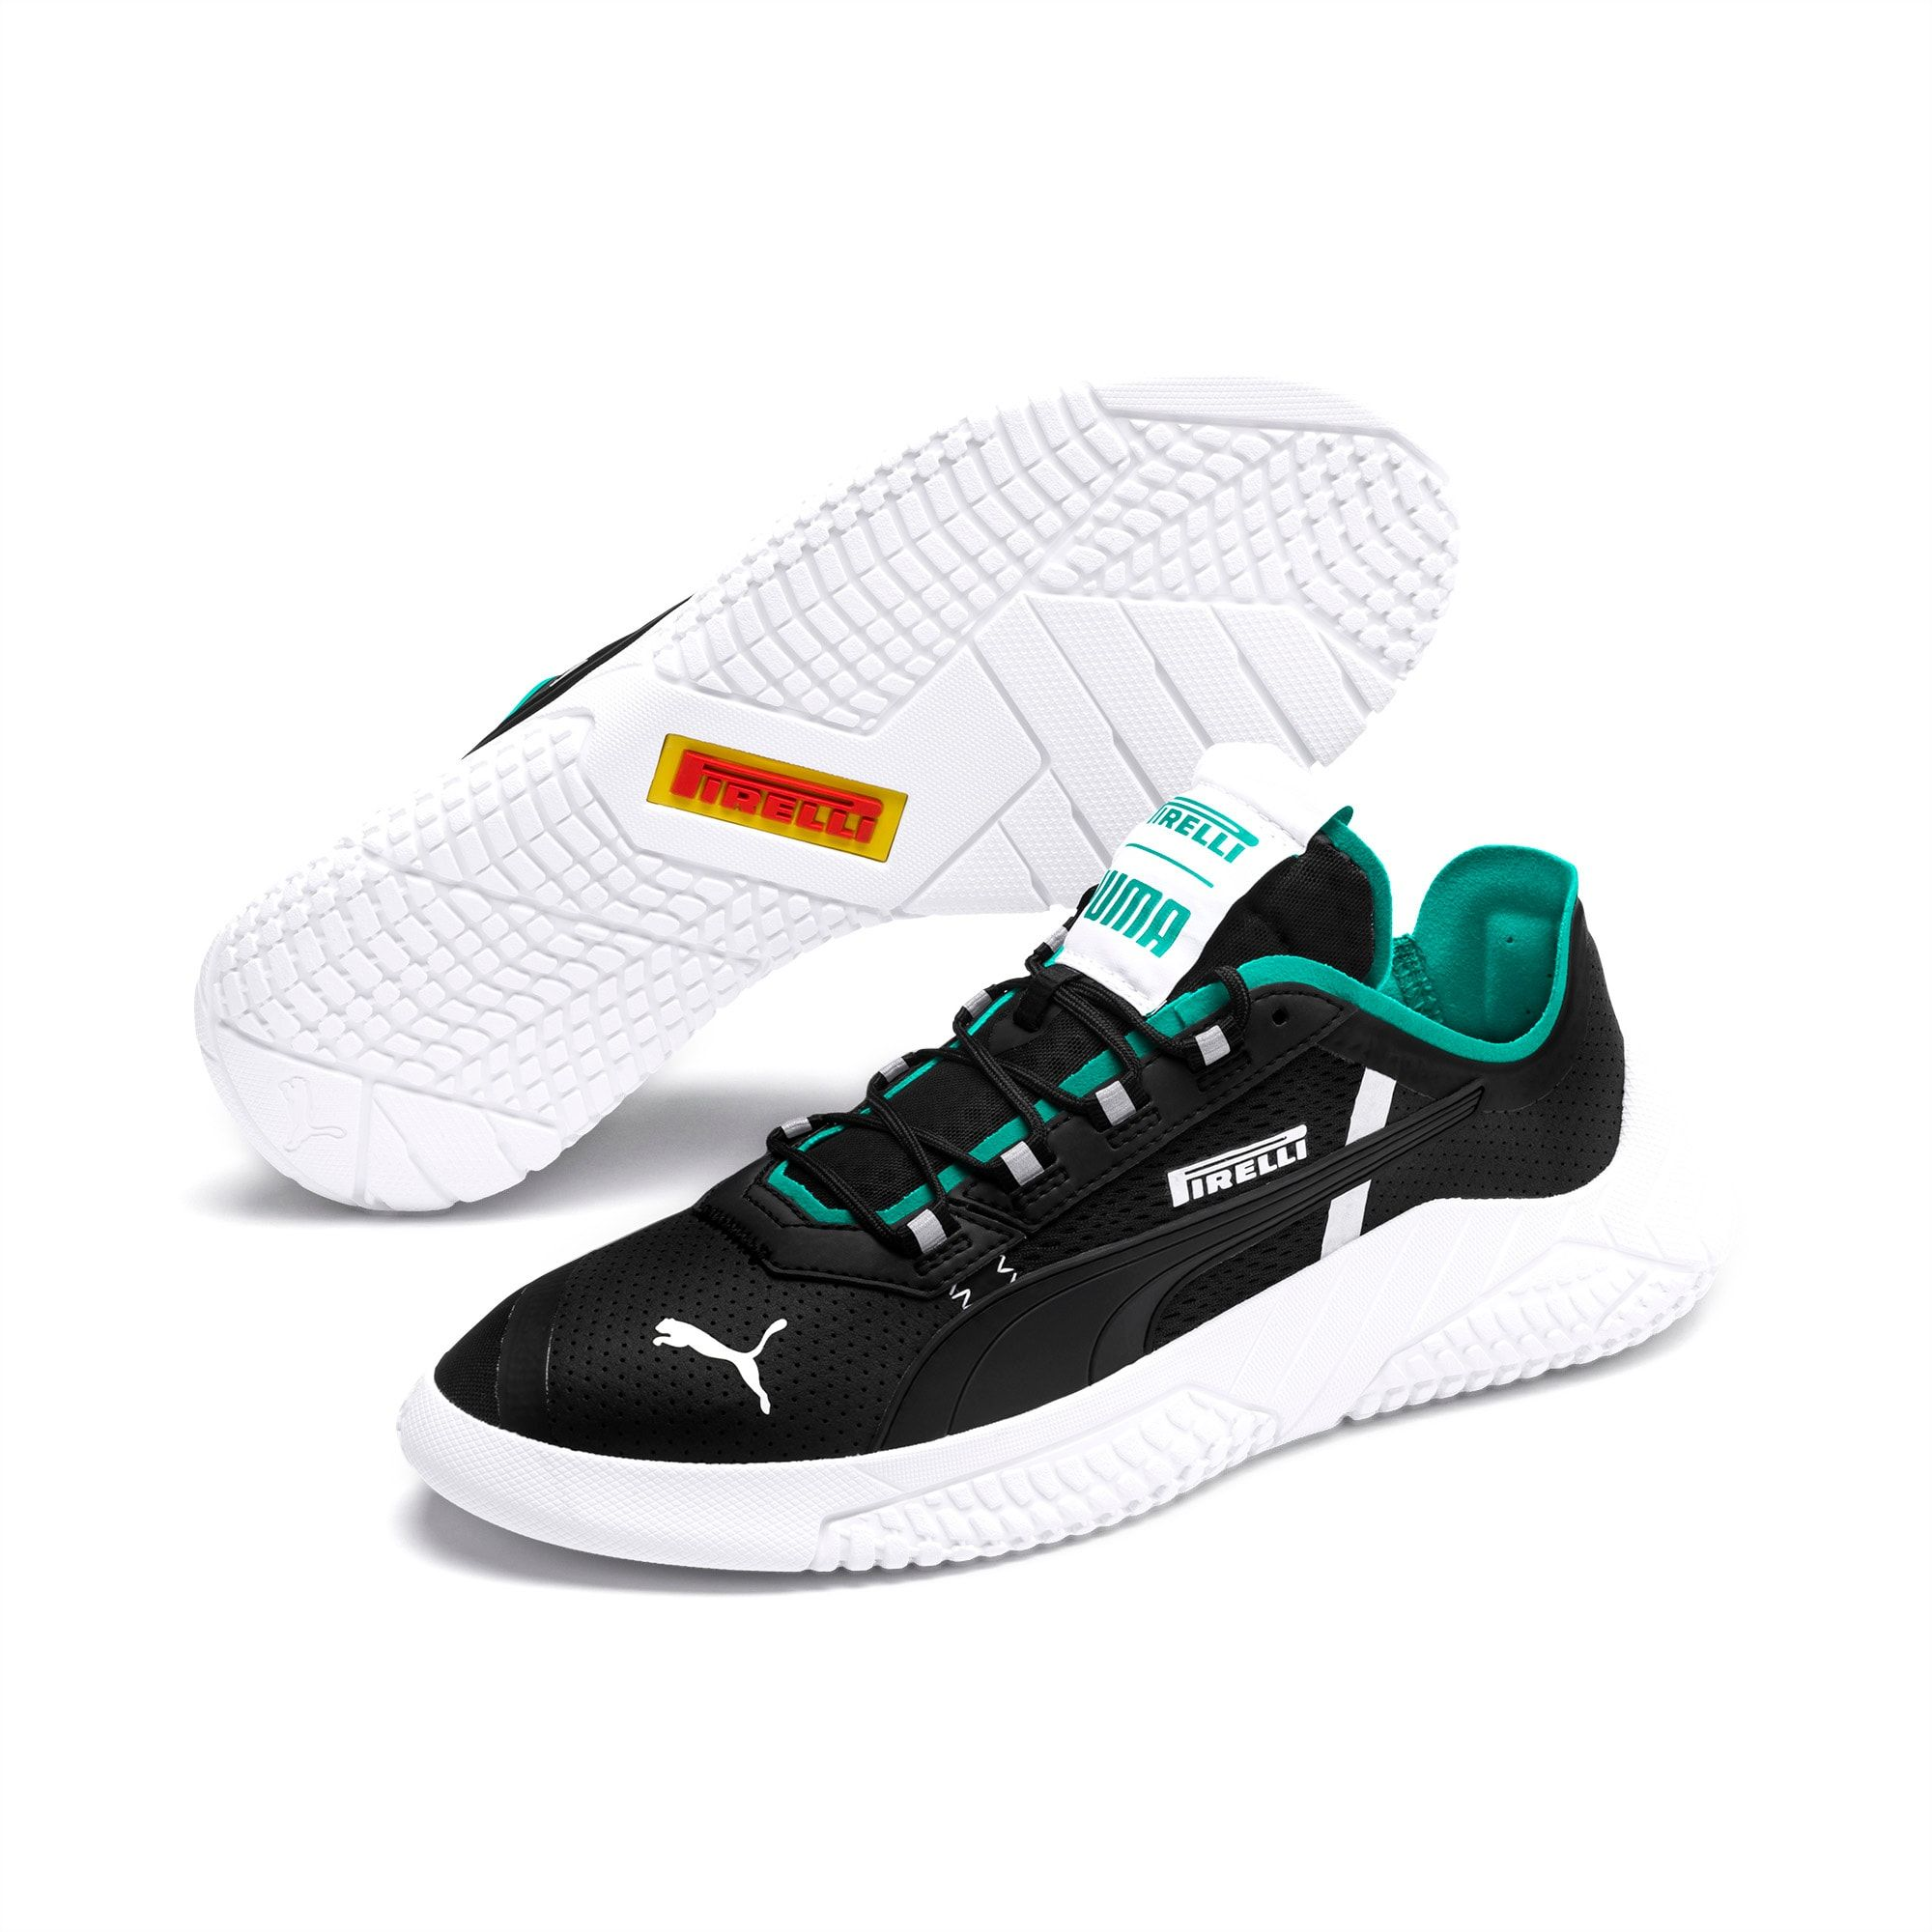 Photo of PUMA Pirelli Replicat-X Trainers,  Black/Spectra Green/White, size 10.5, Shoes